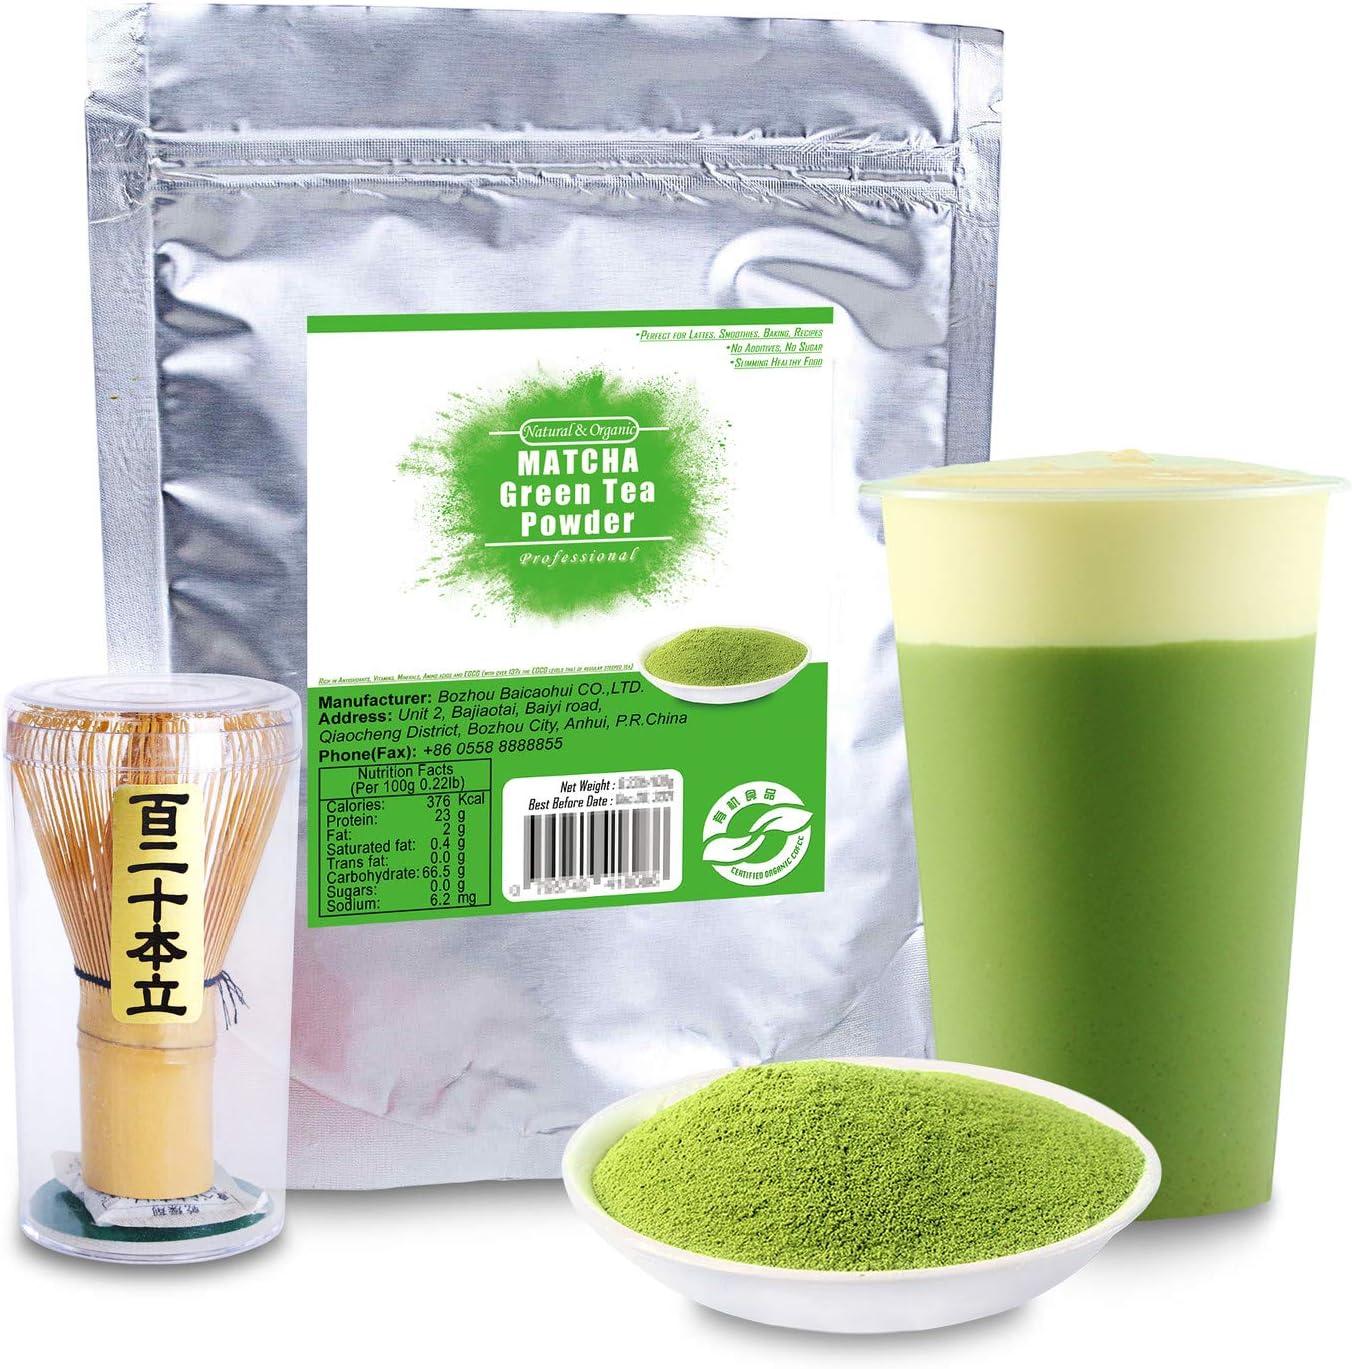 100% Natural Matcha Green Tea Powder + Max 63% OFF Ceremon Bag Japanese 250g Japan Maker New